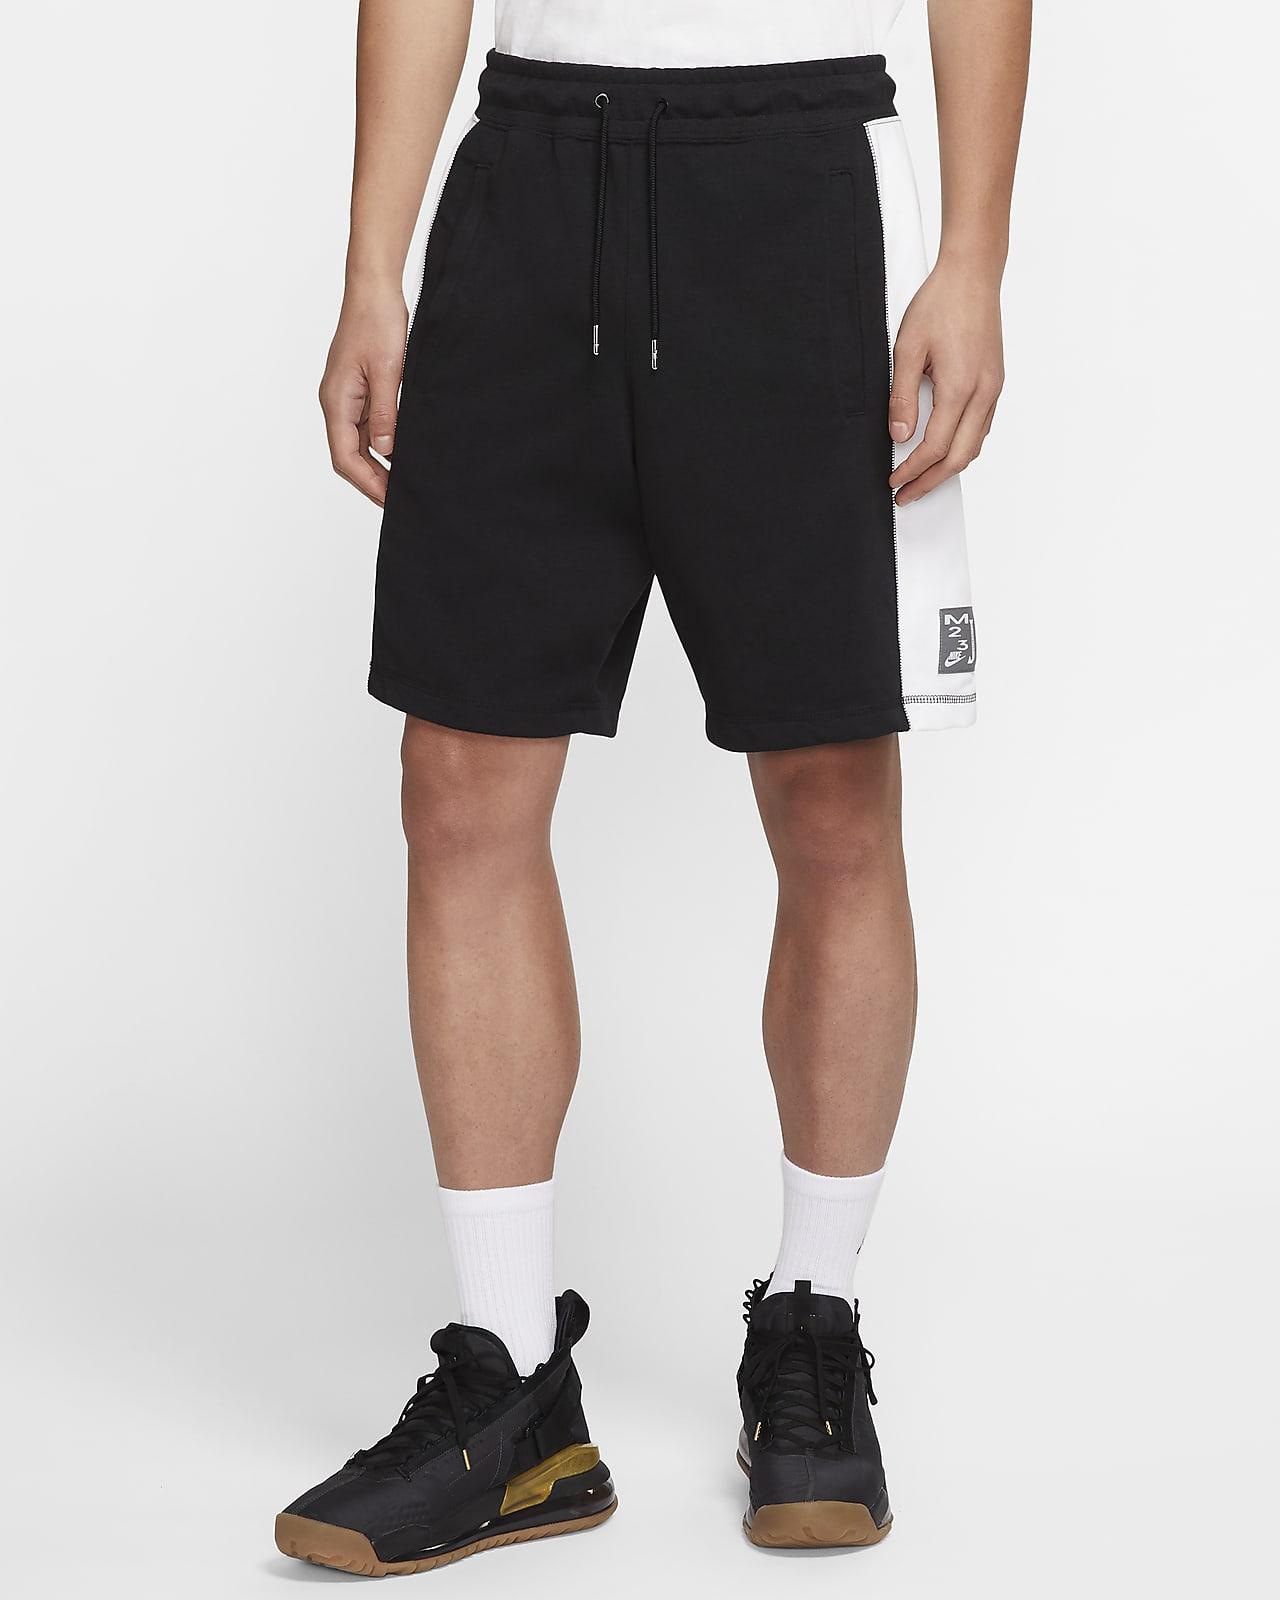 Jordan Sport DNA 男子针织短裤